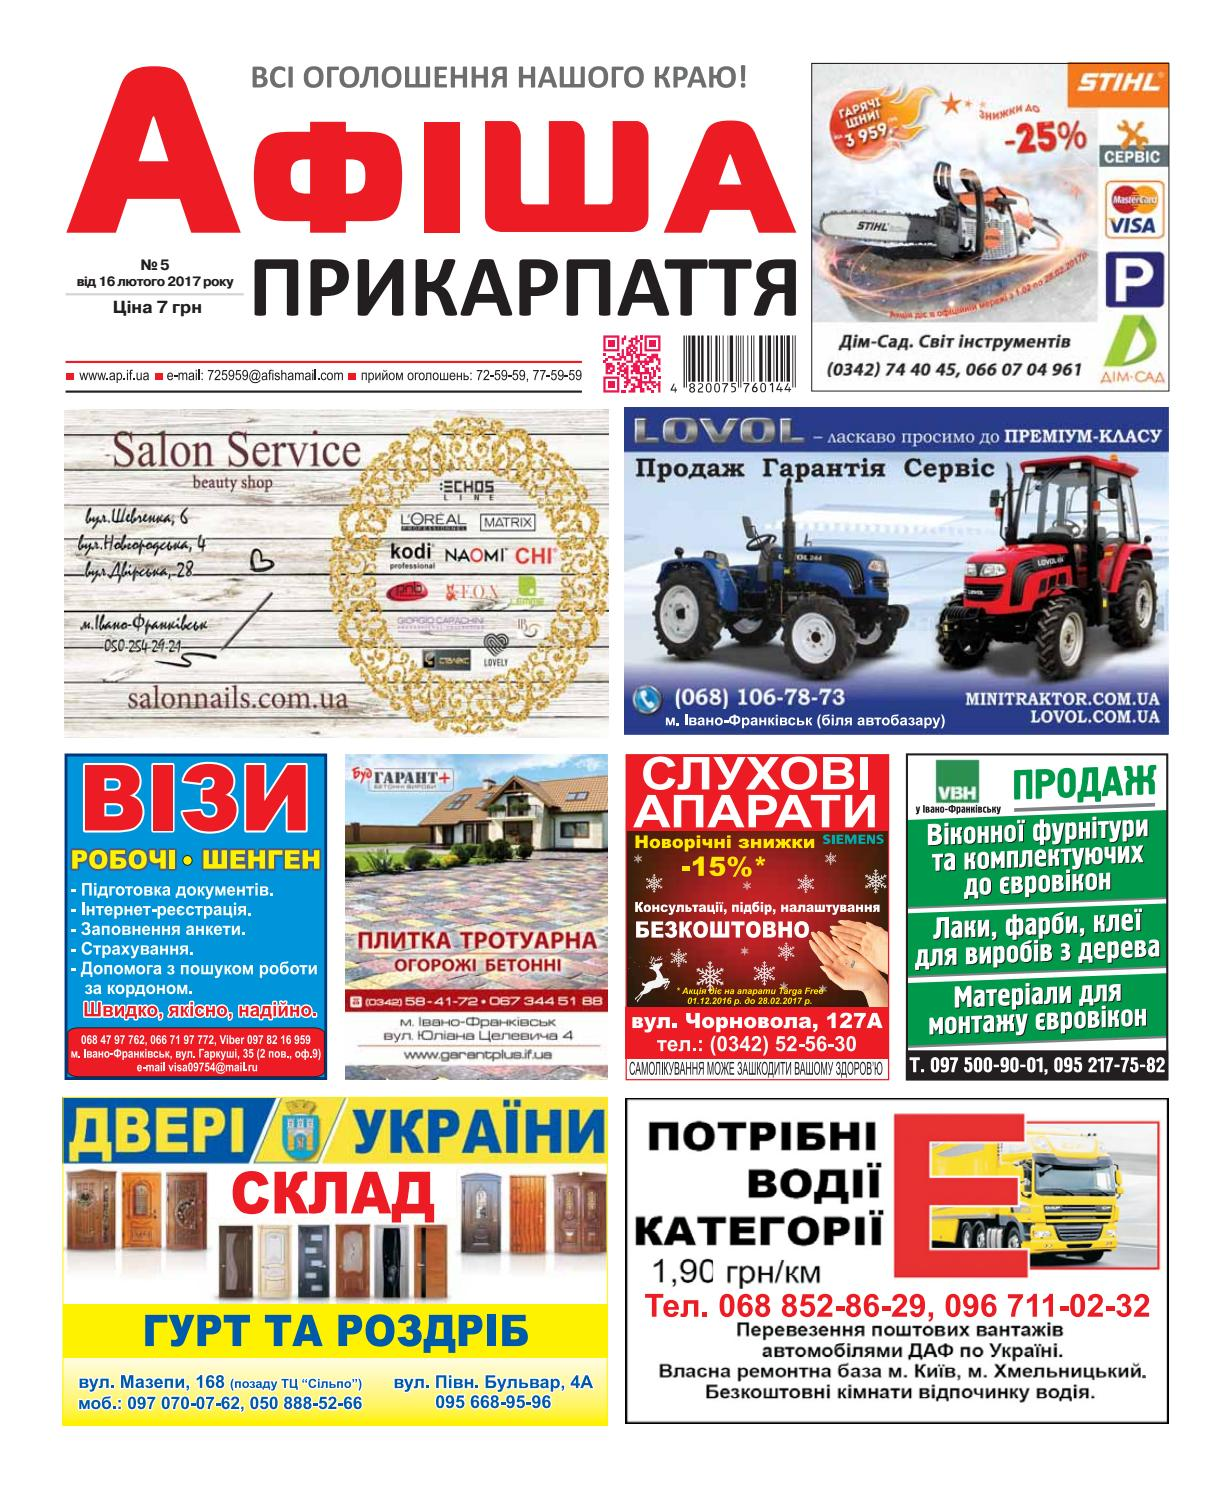 Афіша Прикарпаття 5 by Olya Olya - issuu b7b47104c949f